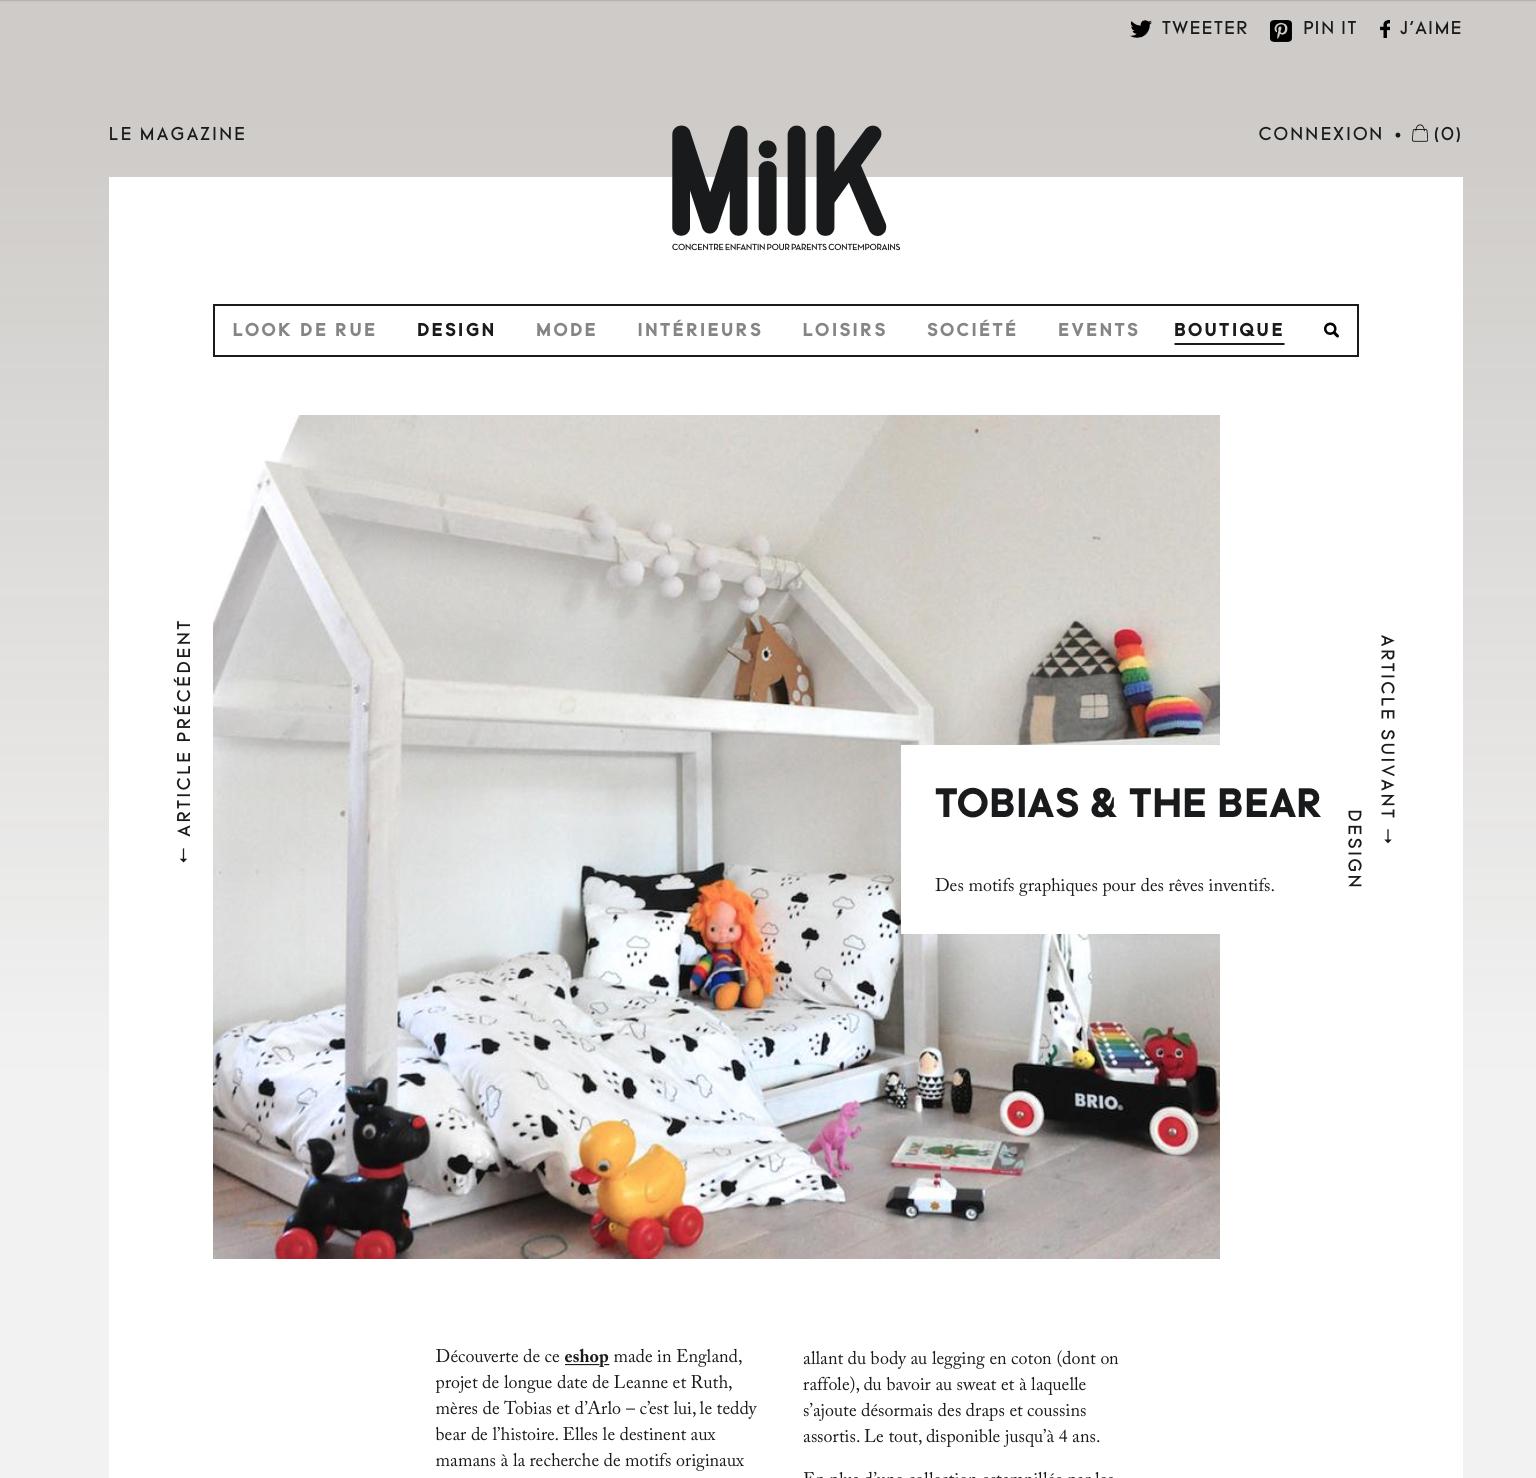 Milk features Tobias & The Bear